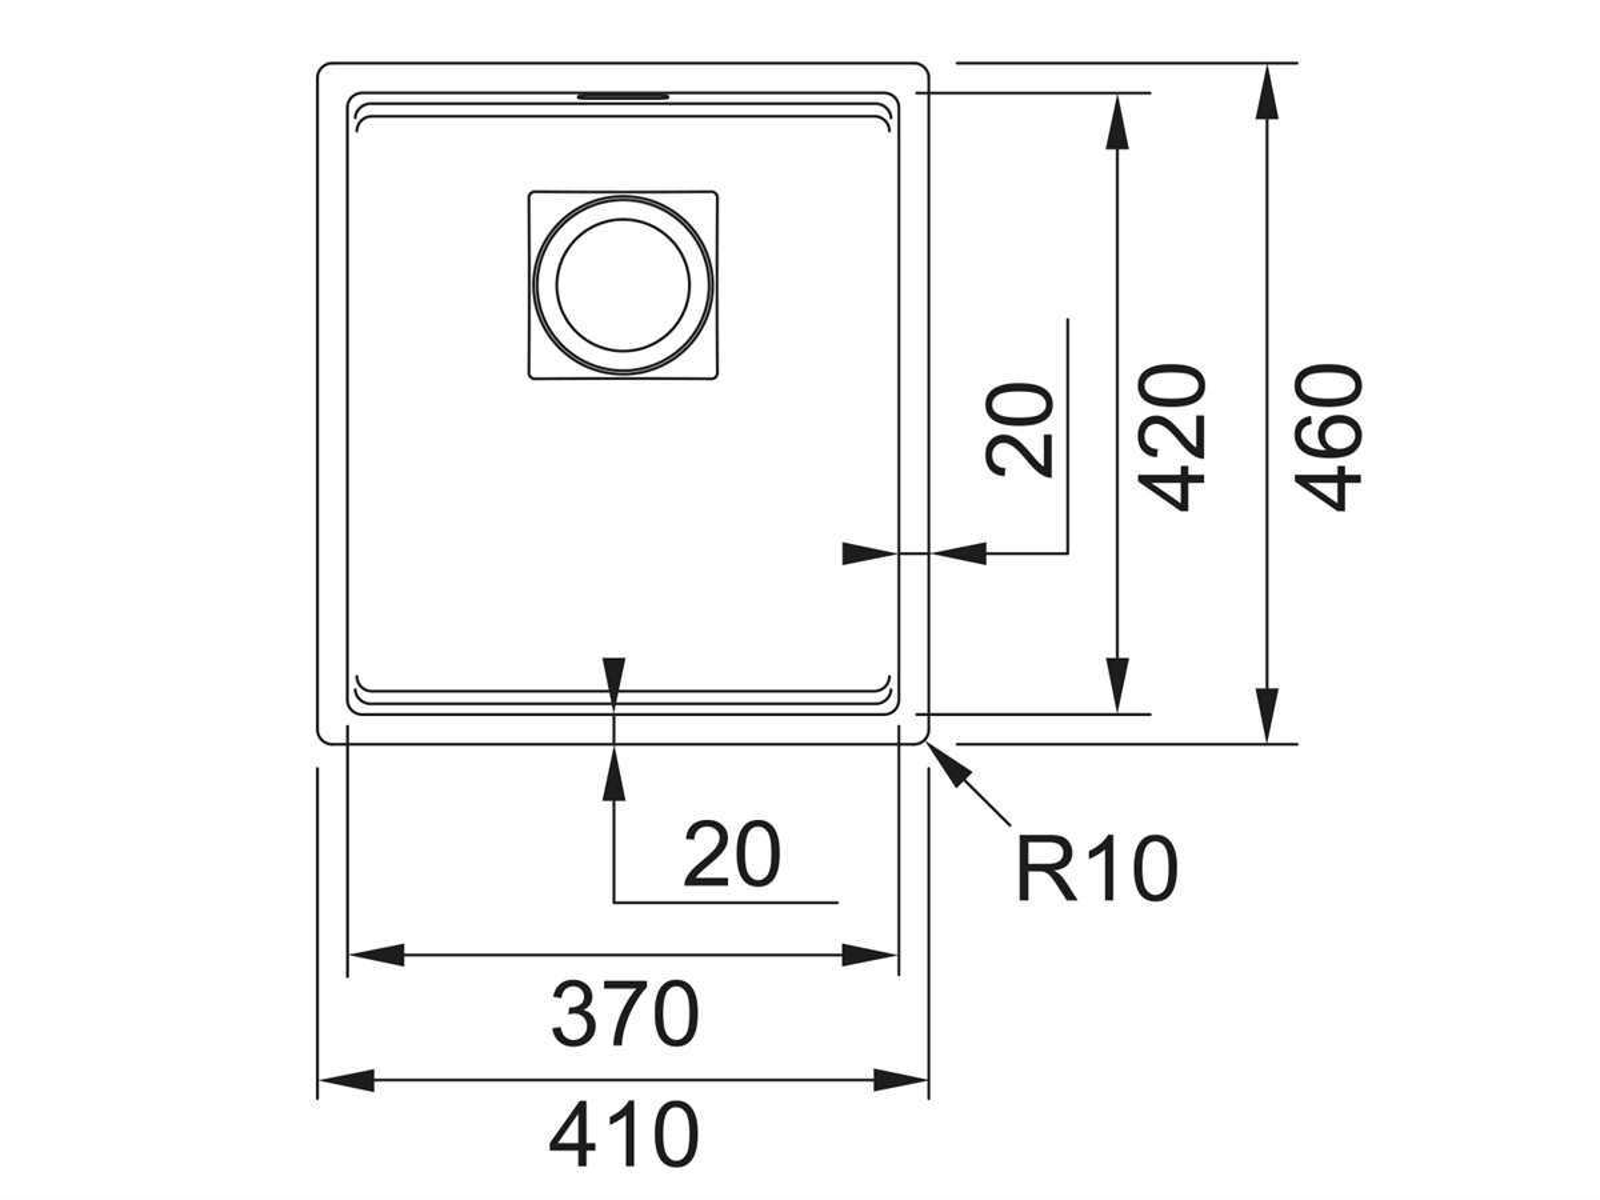 Franke Kubus 2 KNG 110-37 Onyx - 11639 Granitspüle Exzenterbetätigung